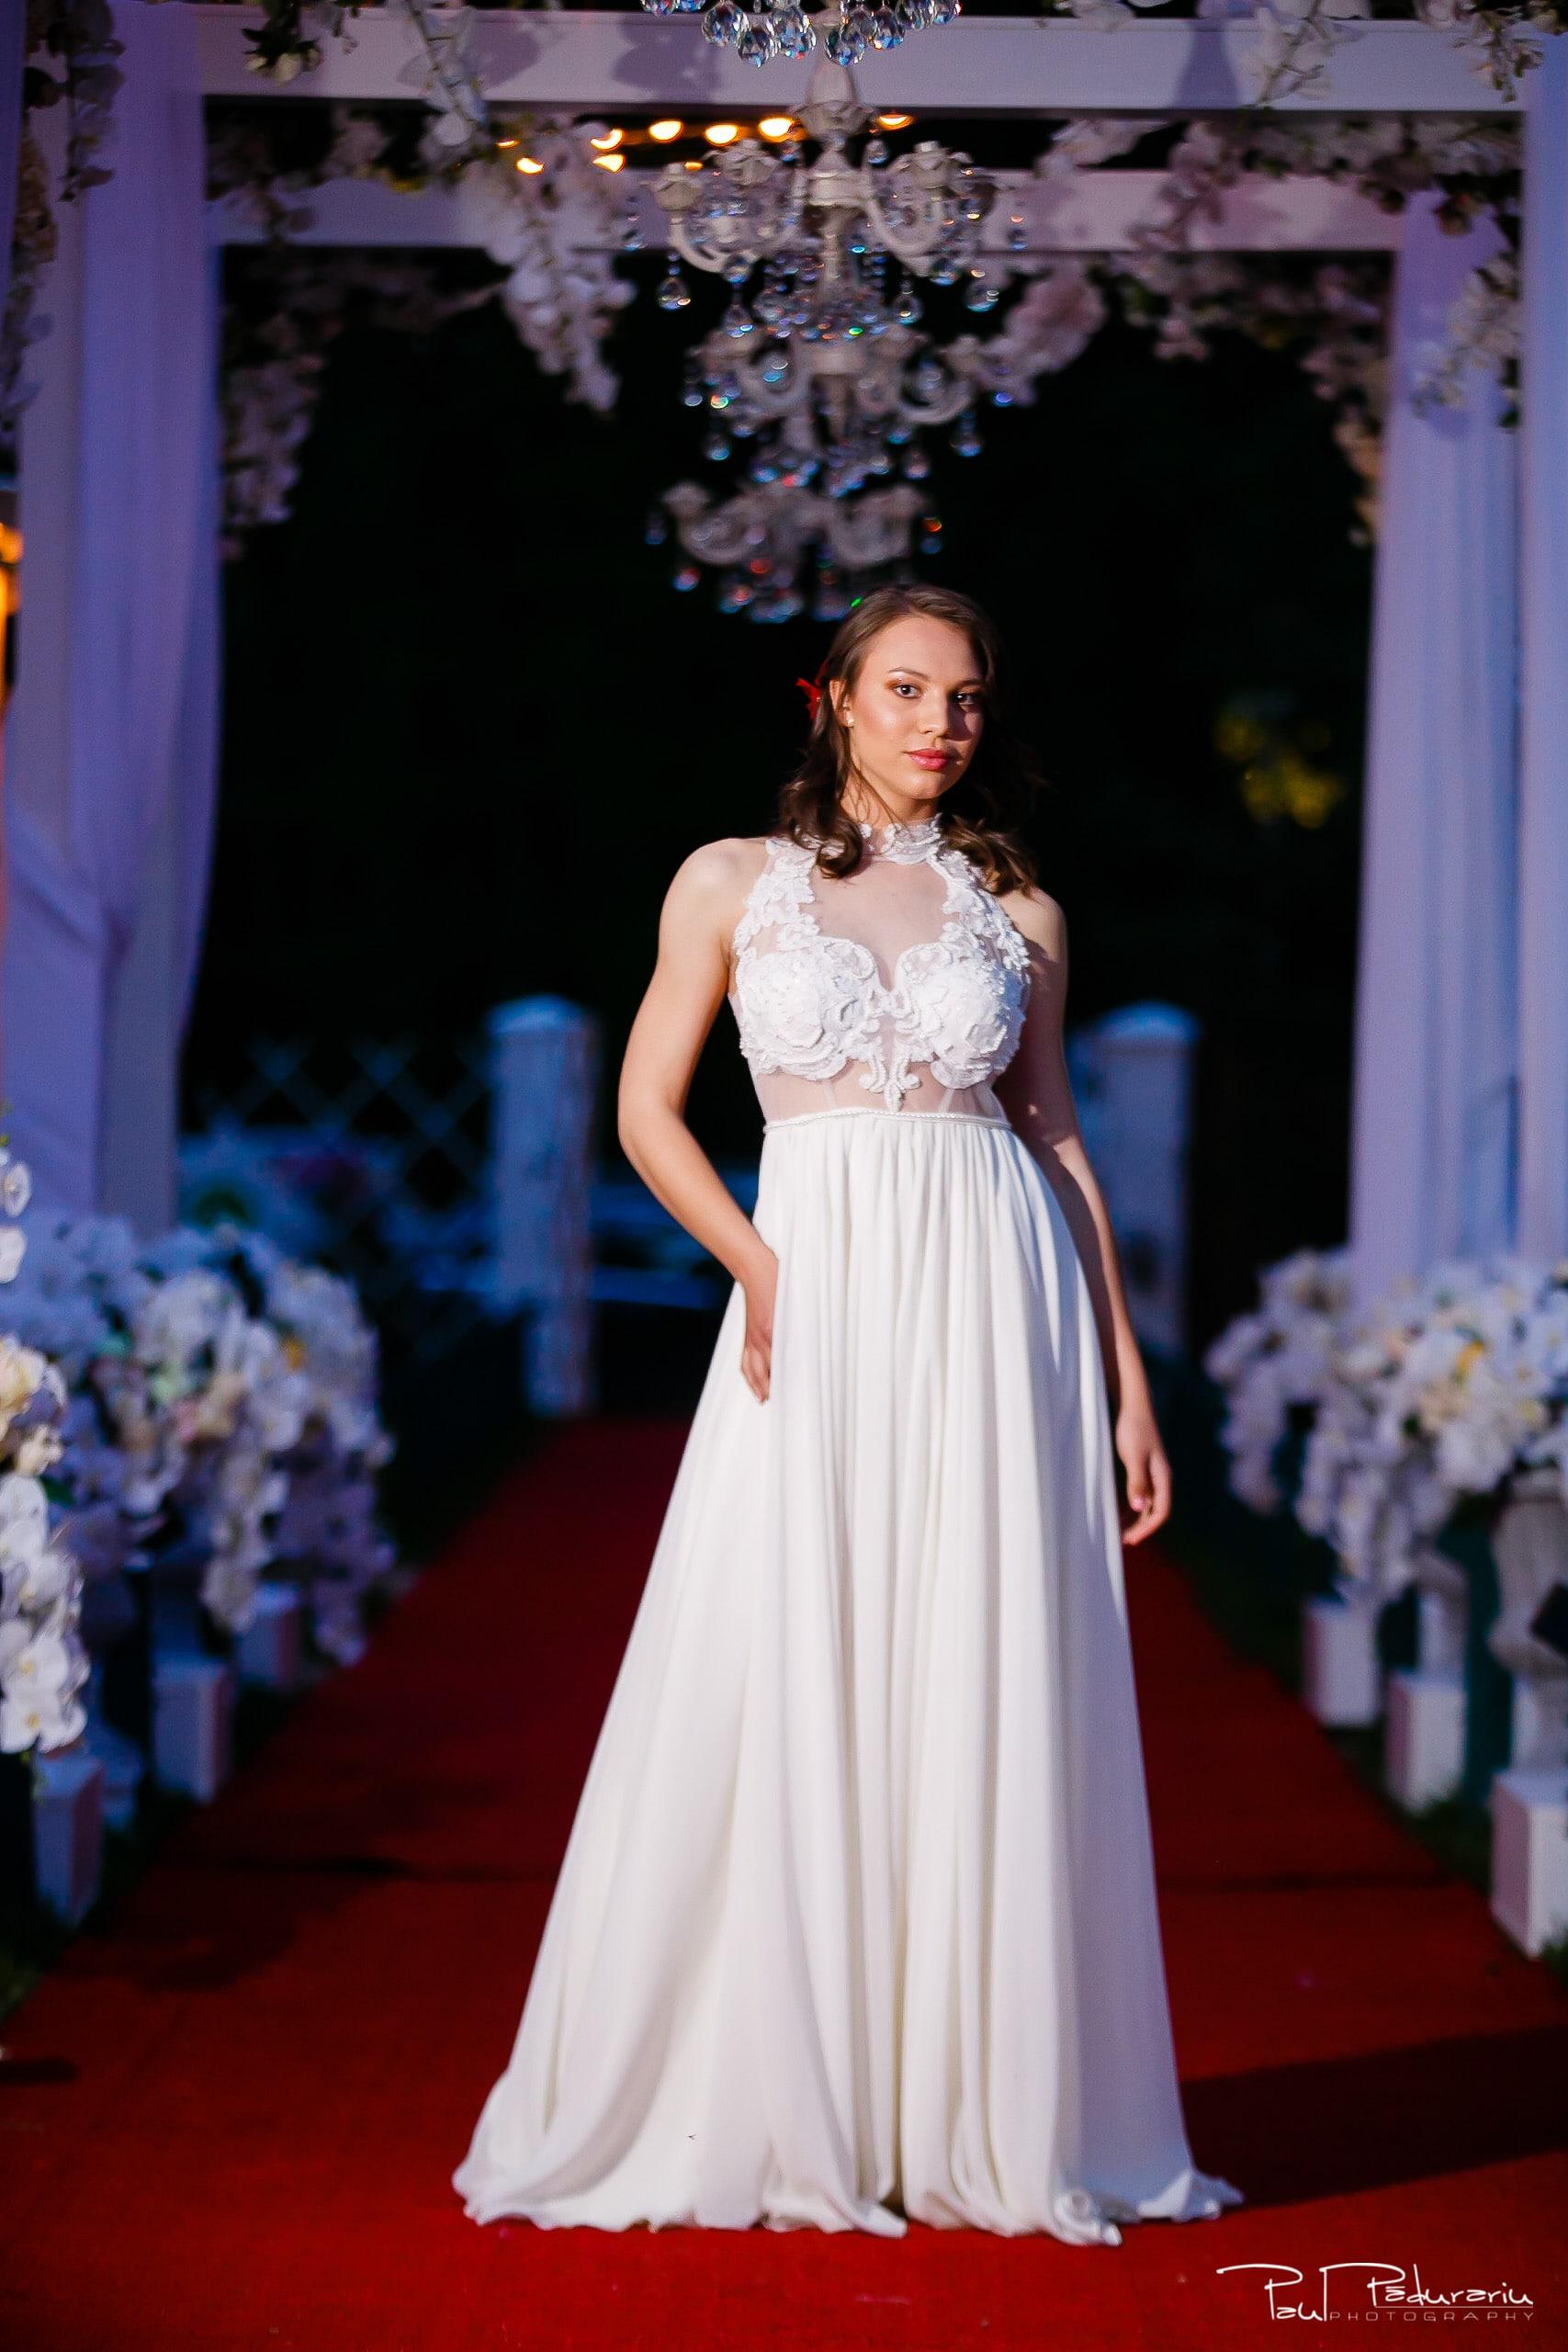 Modern Bride Edith Val colectie rochie mireasa 2019 - fotograf profesionist iasi paul padurariu | nunta iasi 13